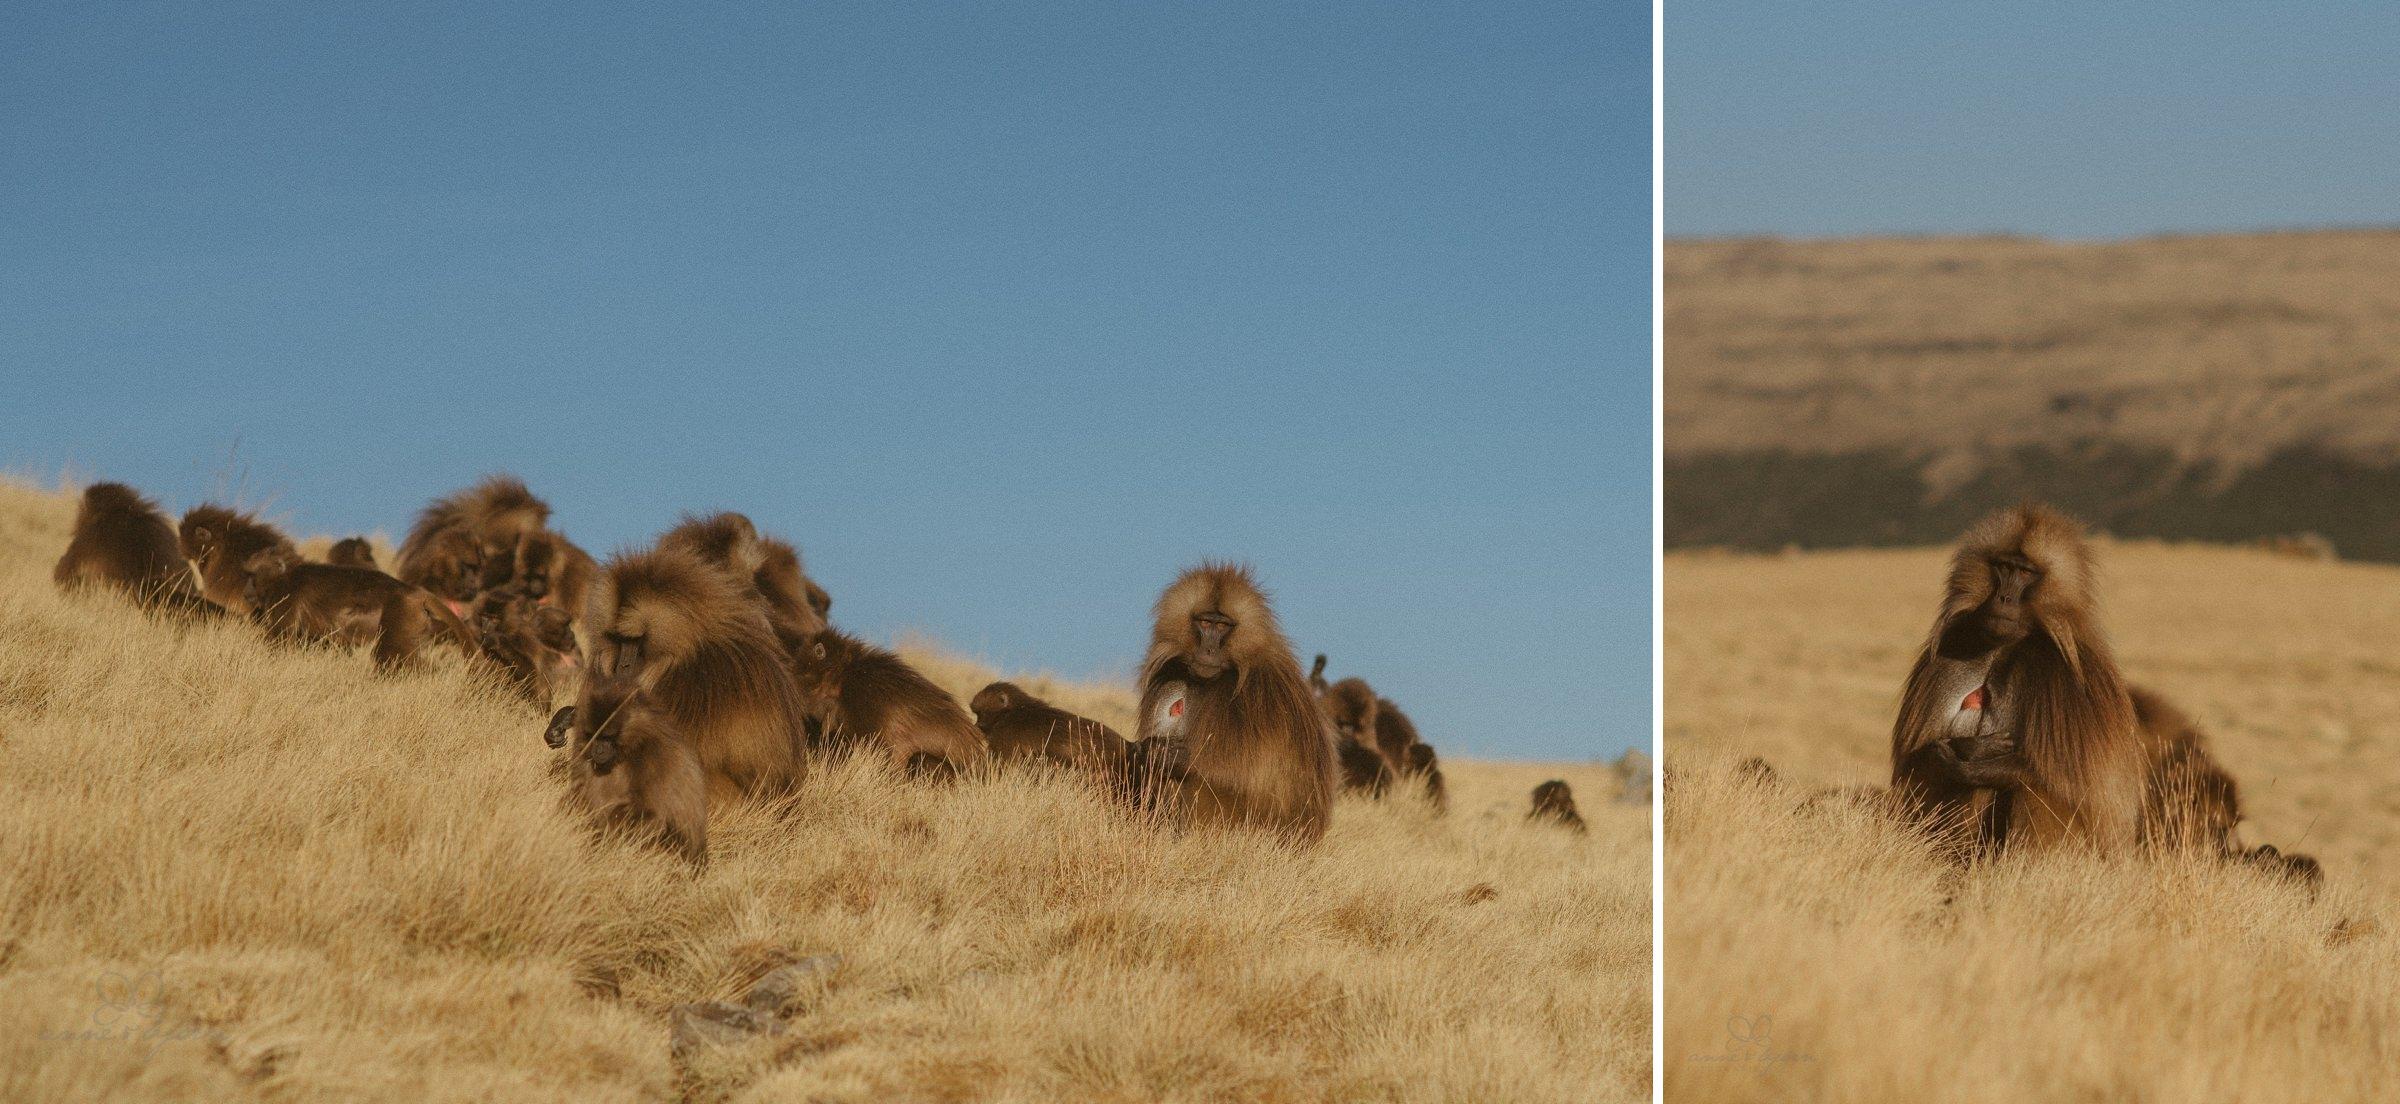 Gelada Monkey, Monkey, Affen, Blutbrustpaviane, Gruppe, Berg, Simien Mountains, Berglandschaft